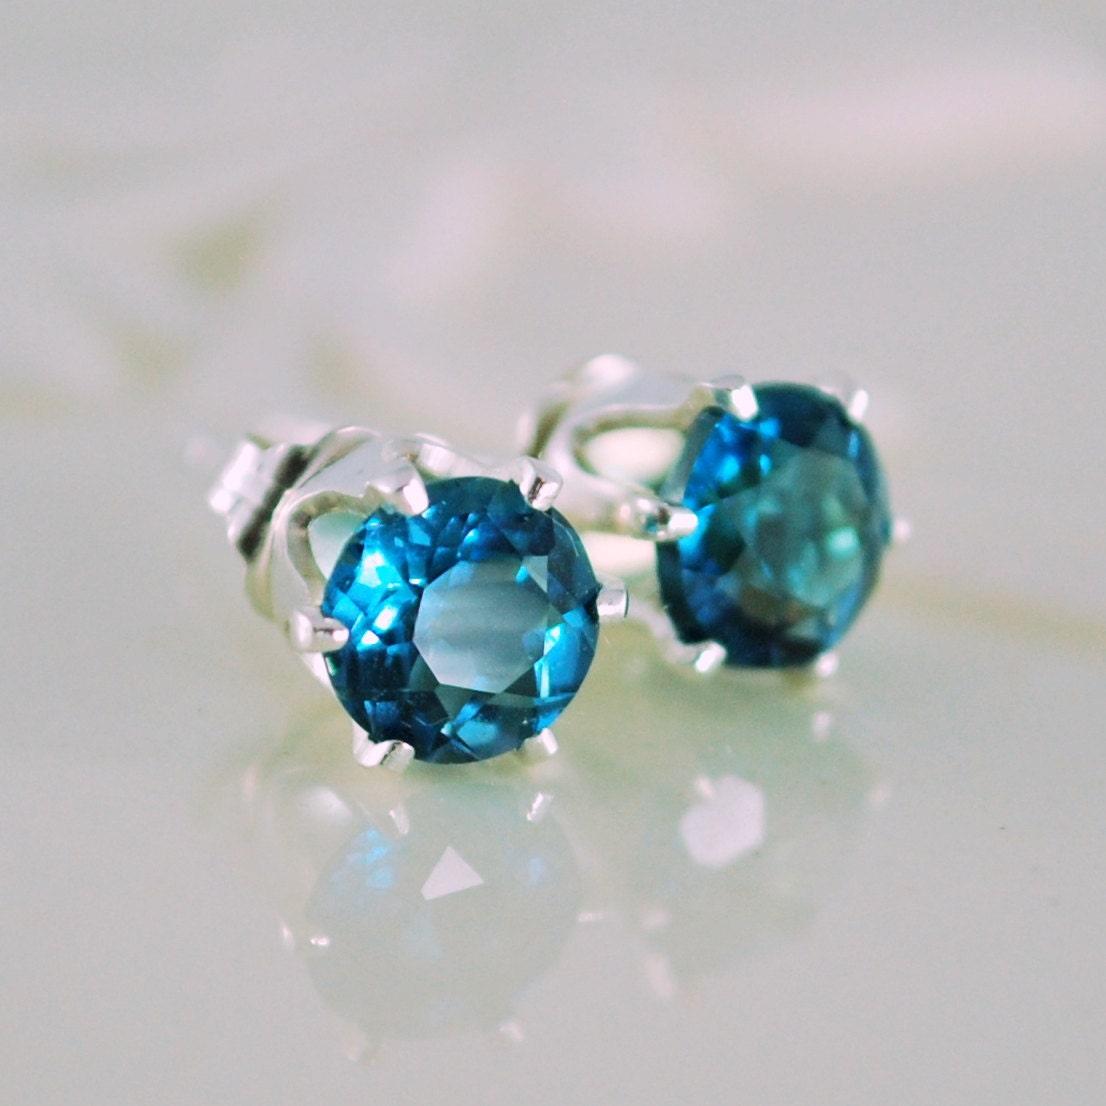 london blue topaz stud earrings genuine deep teal gemstone. Black Bedroom Furniture Sets. Home Design Ideas